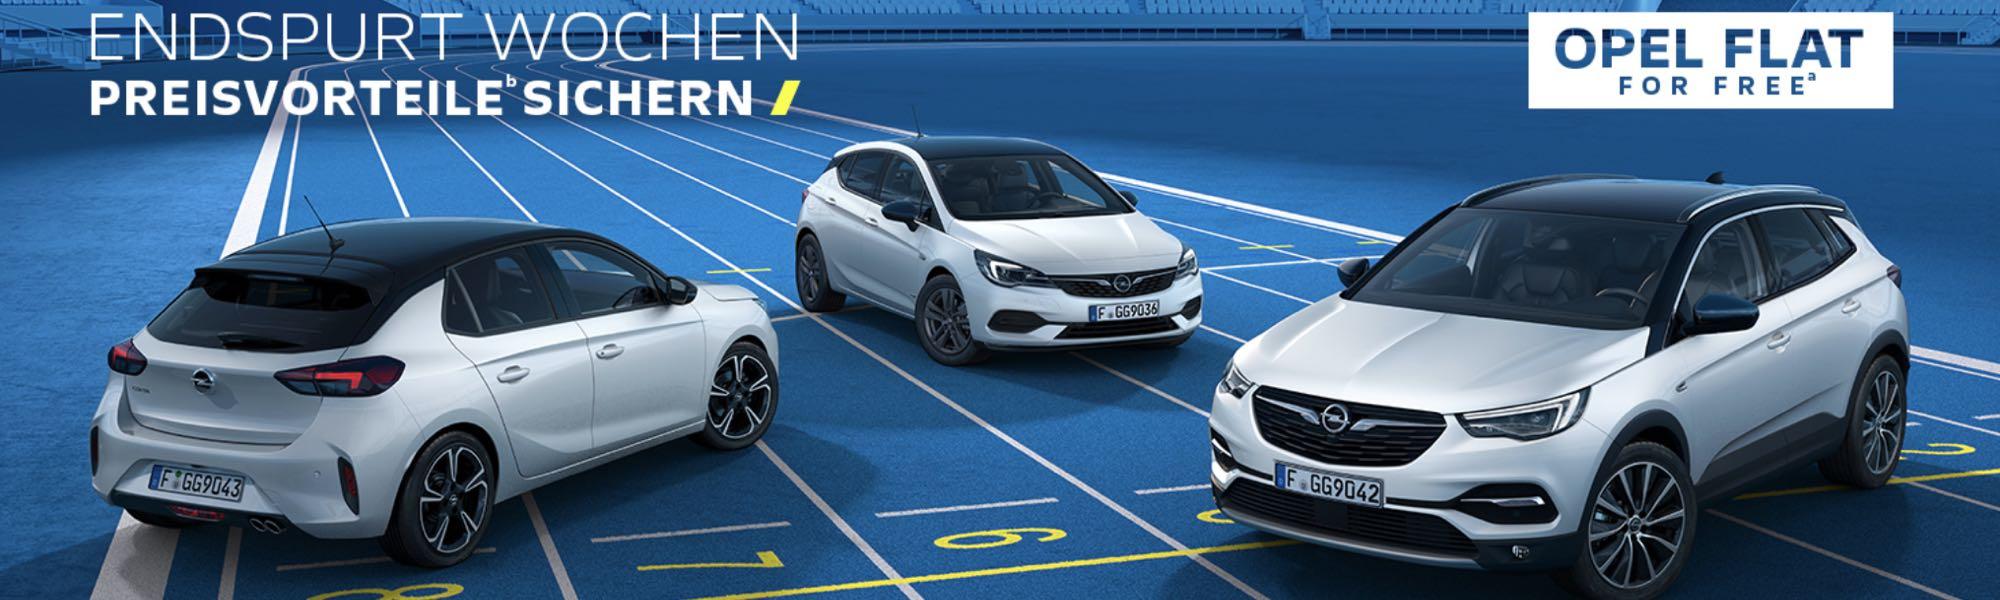 Opel Endspurt-Wochen